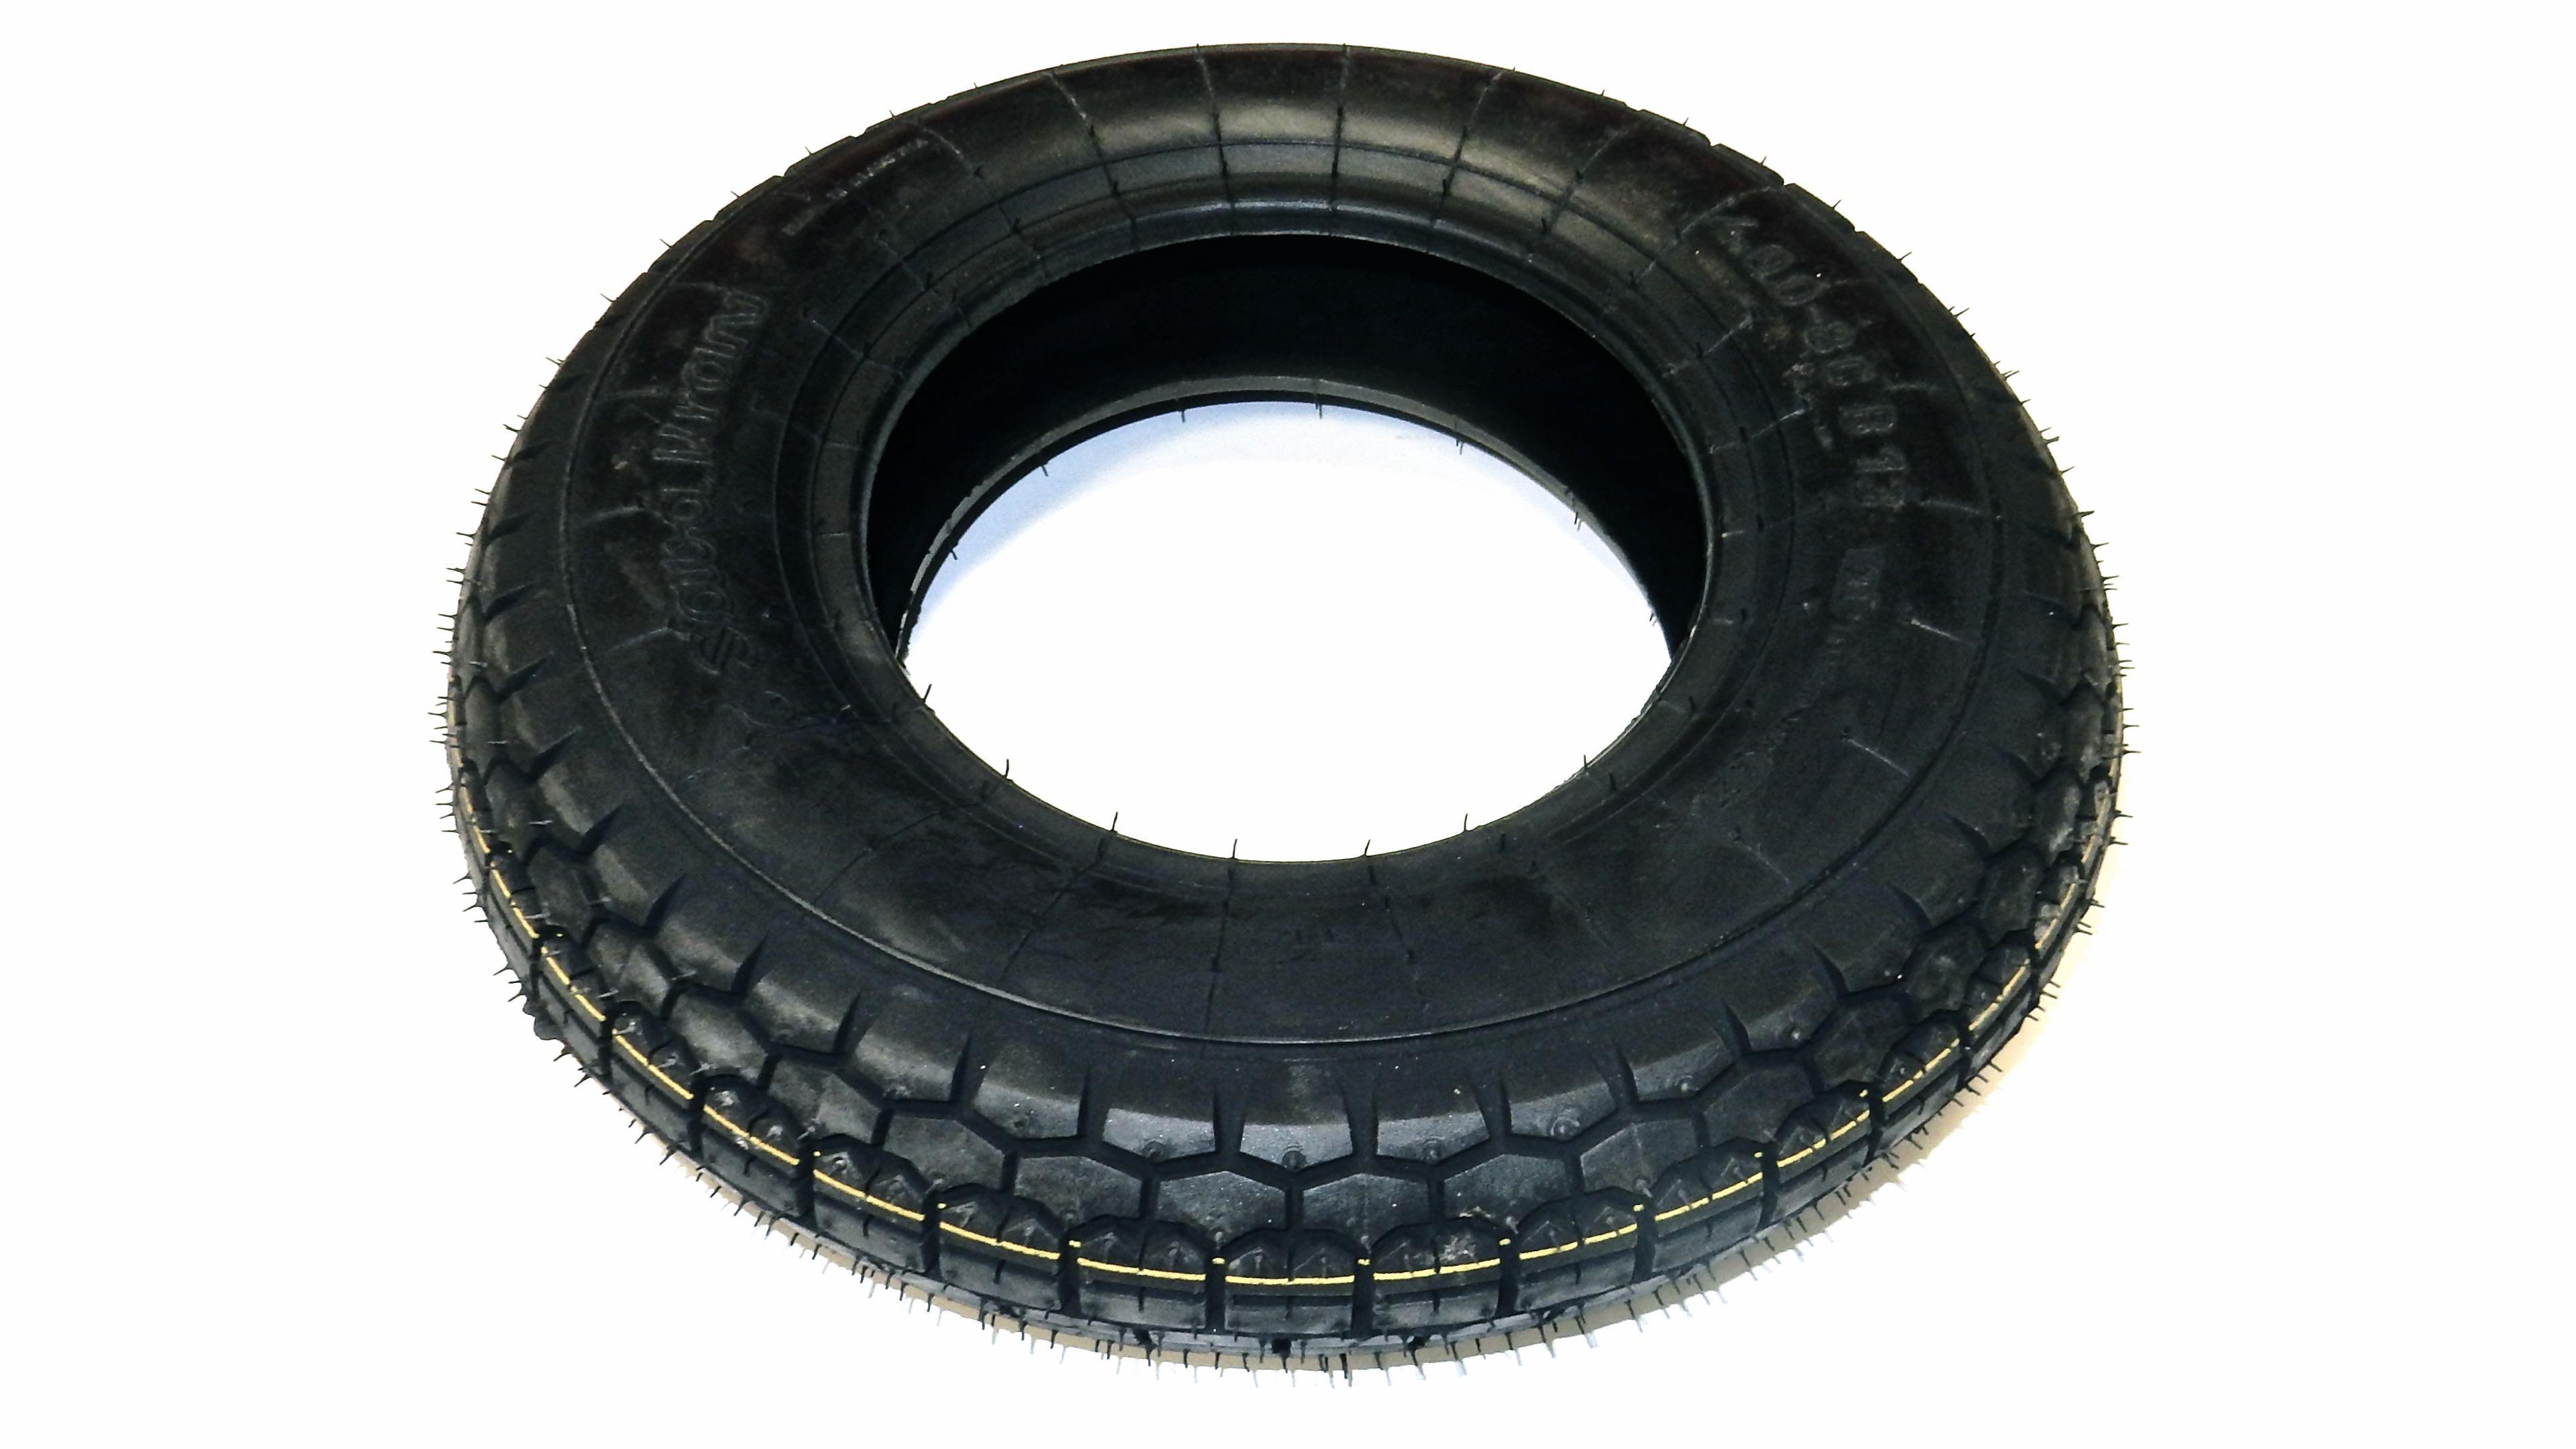 motos pneu accessoires pour moto pneu pirelli sc93 cr ations jpl. Black Bedroom Furniture Sets. Home Design Ideas